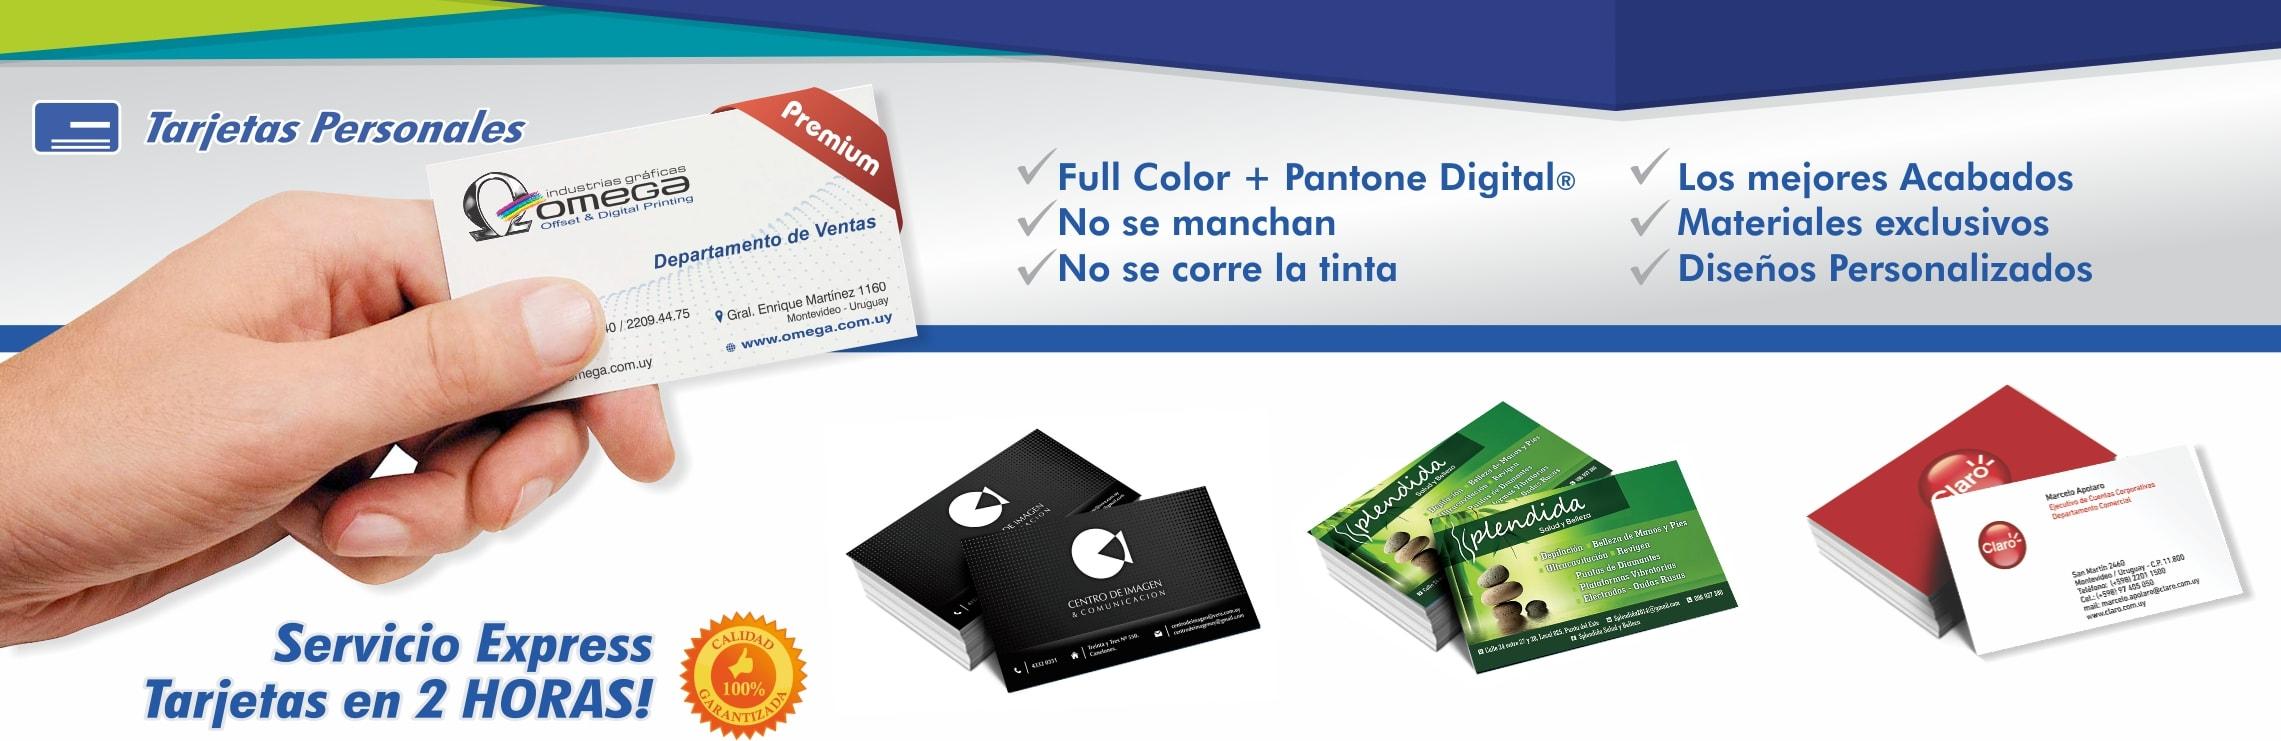 Imprenta Omega Industrias Gráficas Tarjetas Personales